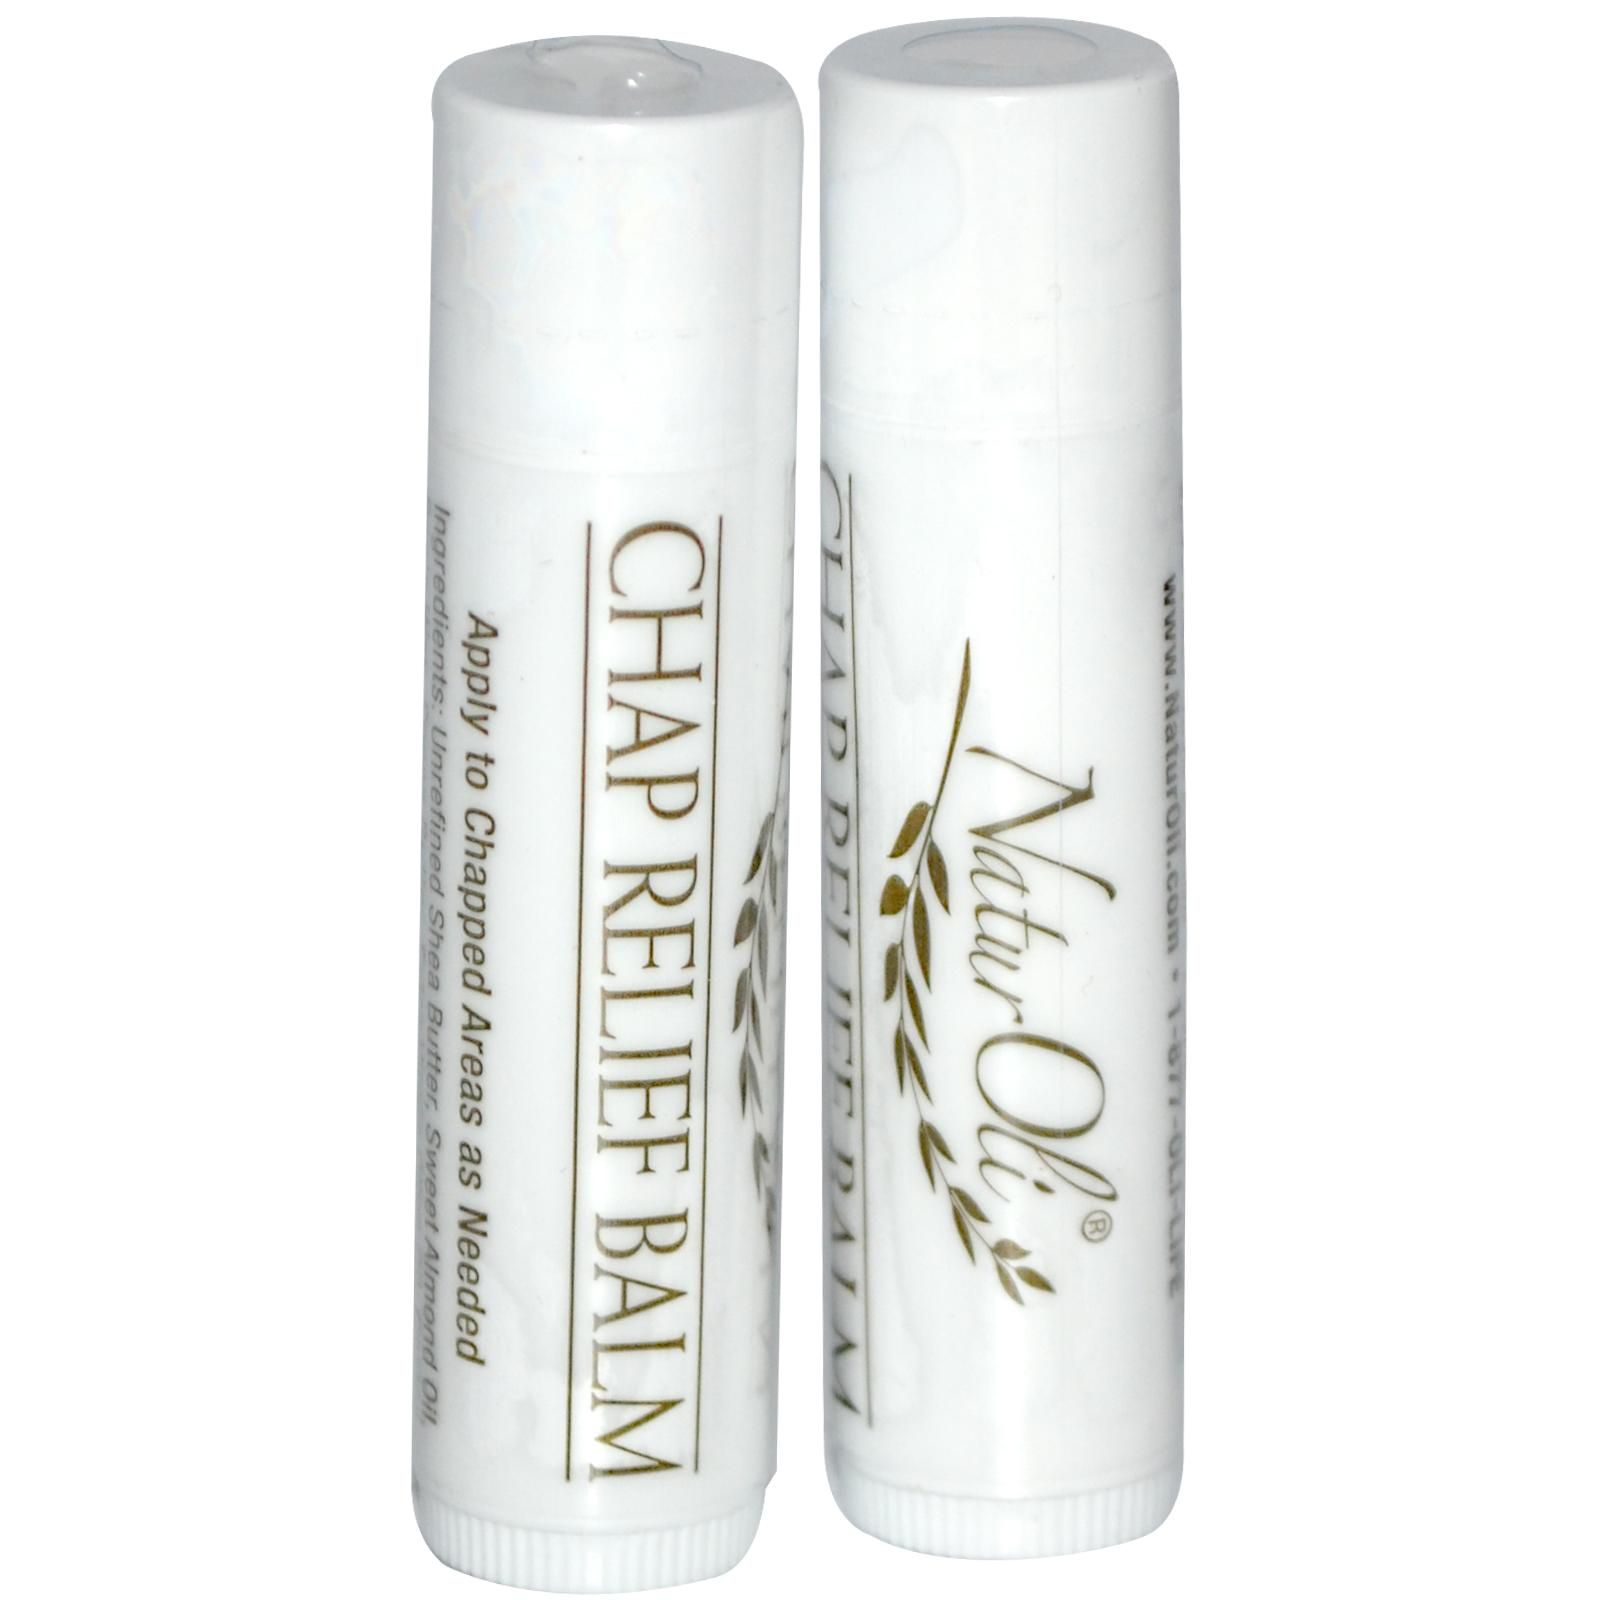 NaturOli, Natural Chap Relief Balm, Peppermint, 2 Pack, 0.15 oz Each